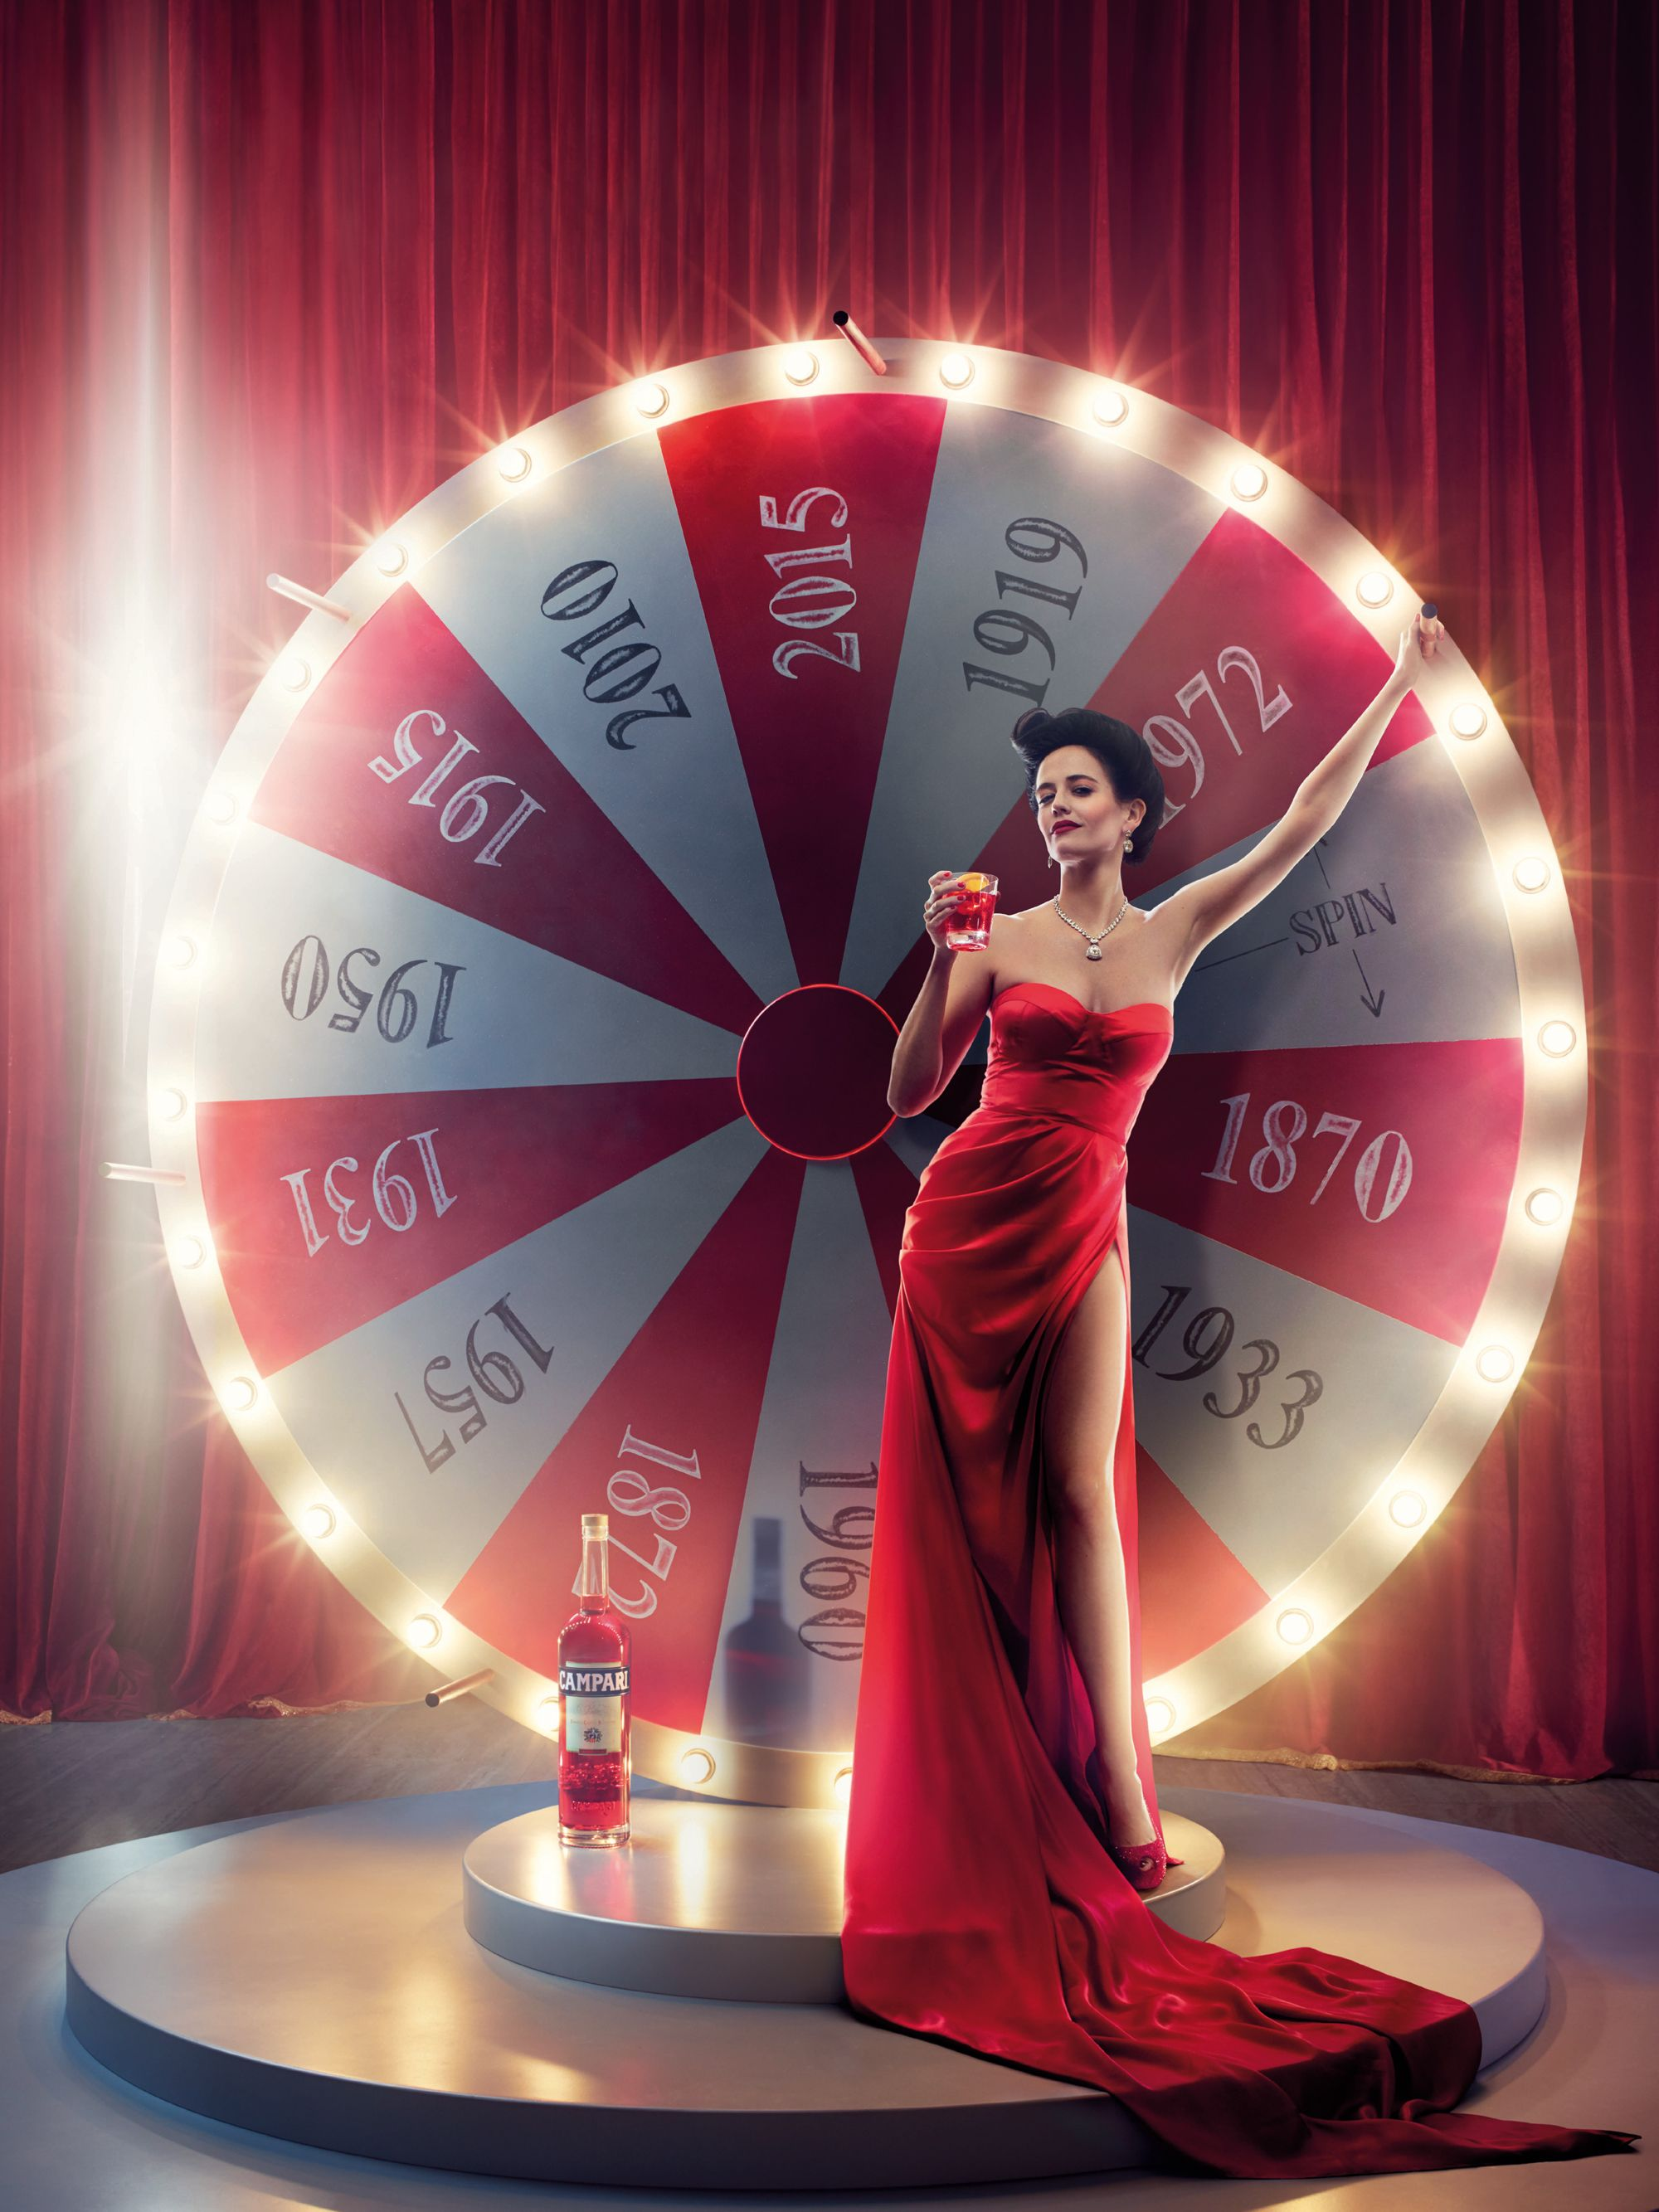 Campari's 2015 exclusive calendar, Eva Green